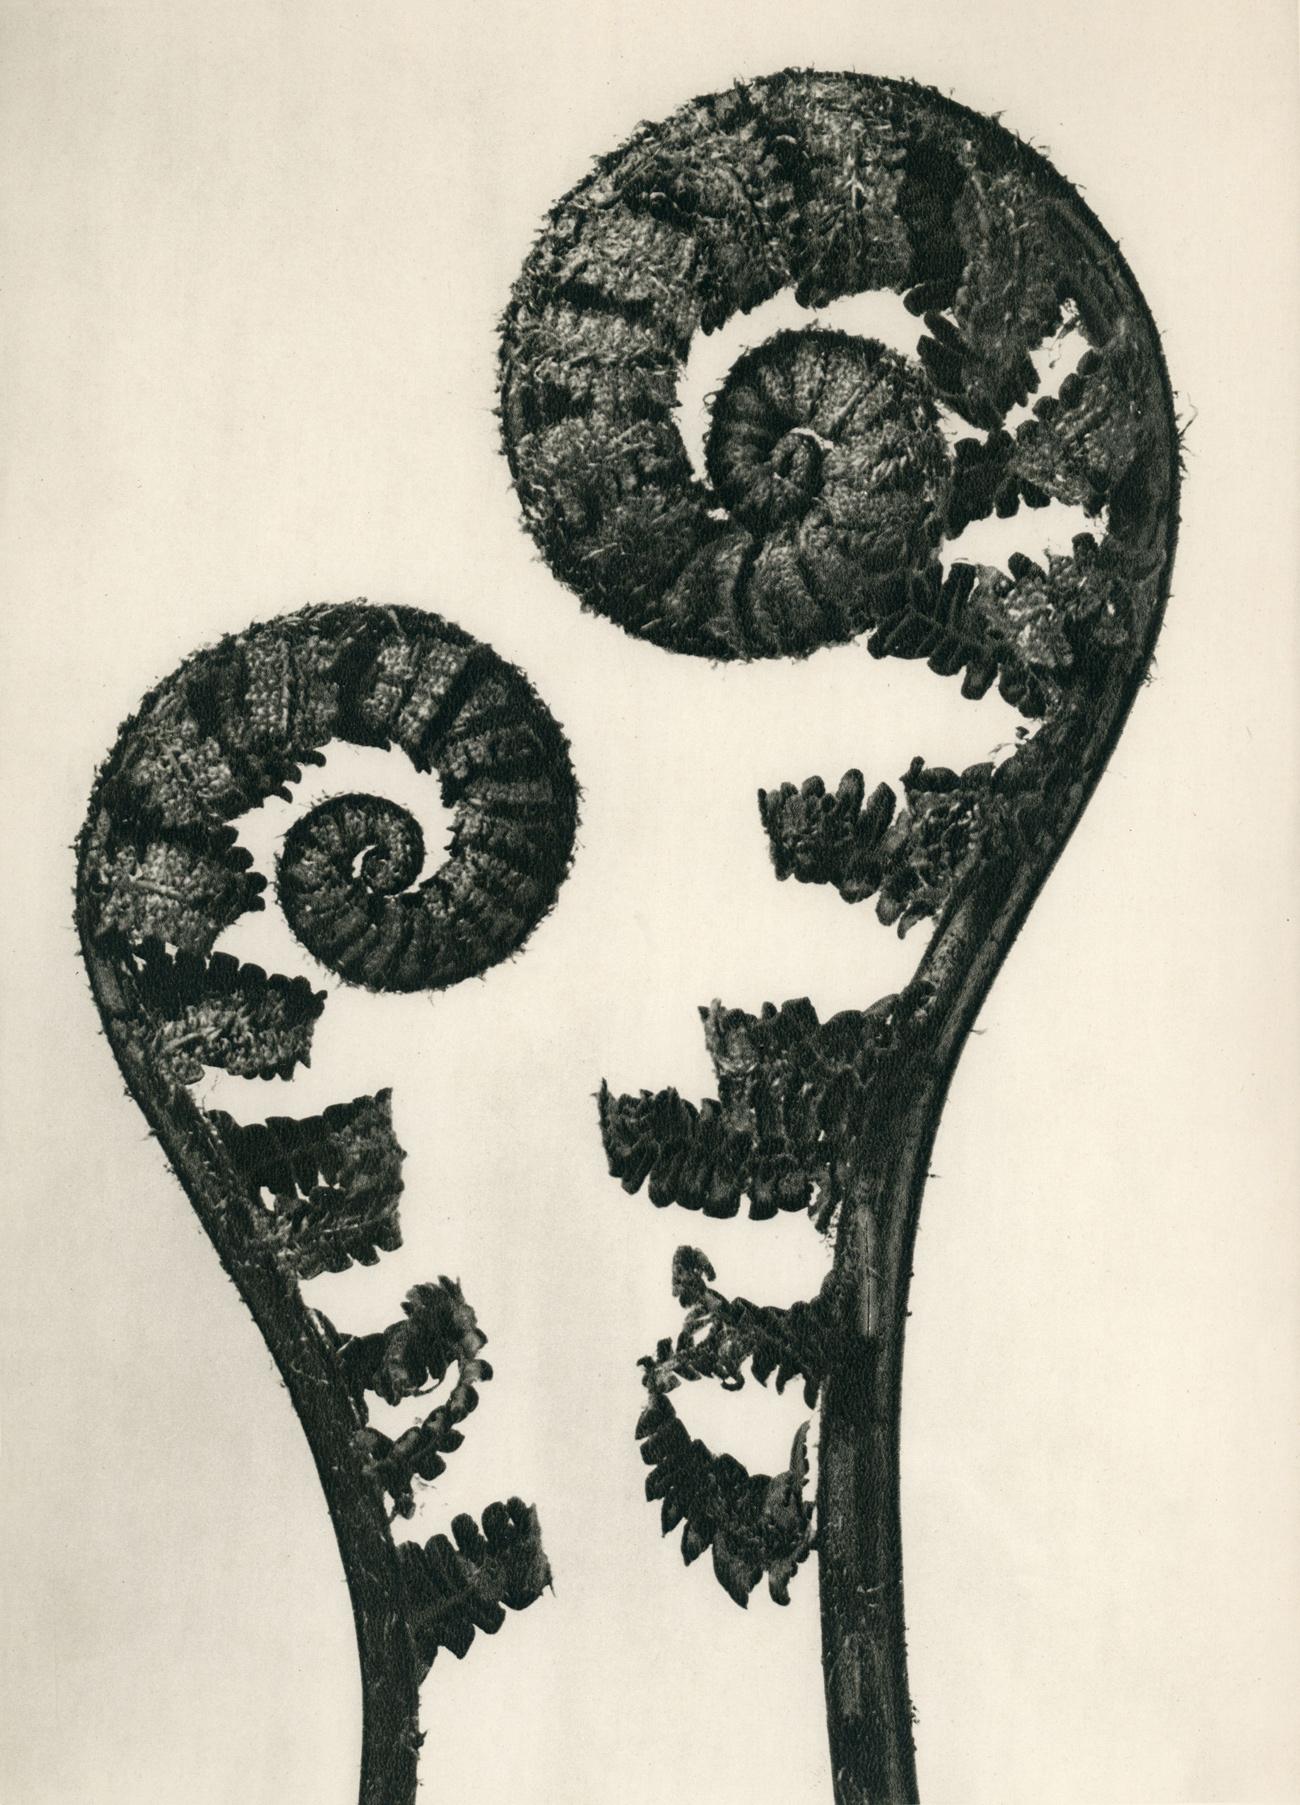 Fotó: Karl Blossfeldt: Dryopteris filix mas, Erdei pajzsika 1928 előtt <br />Karl Blossfeldt Collection at the University of the Arts Berlin